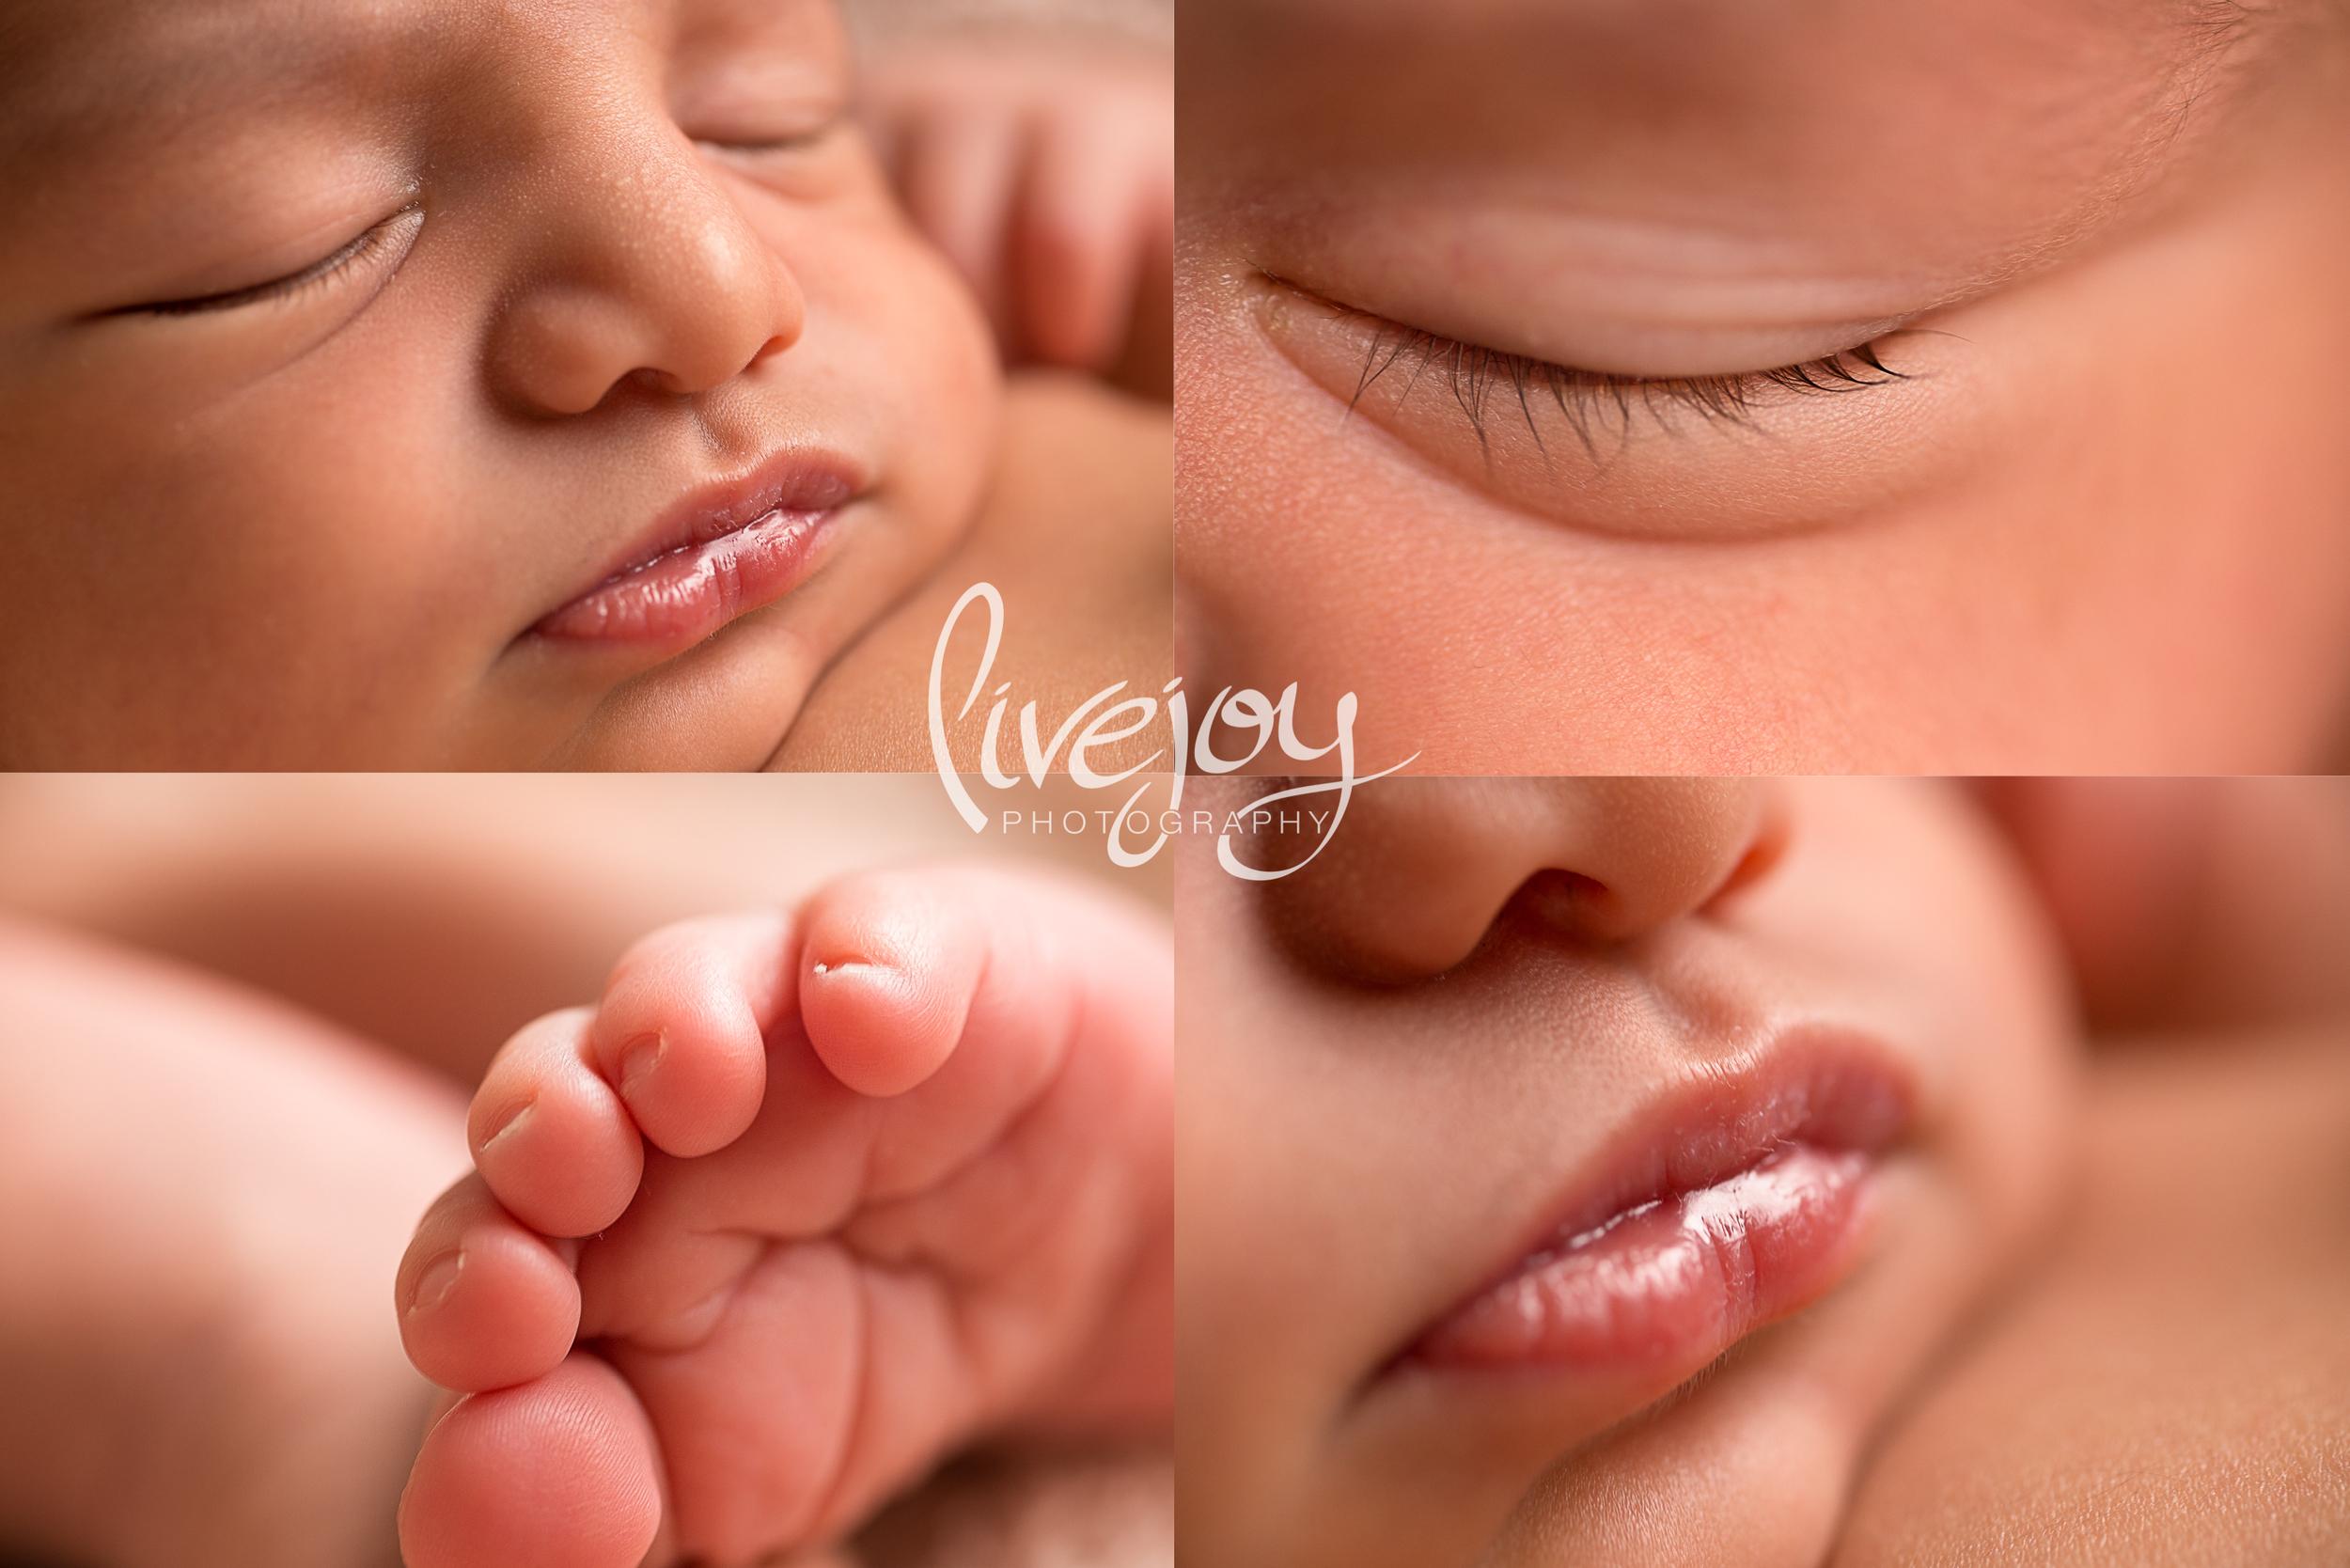 Newborn Photography Macro Details | Oregon | LiveJoy Photography